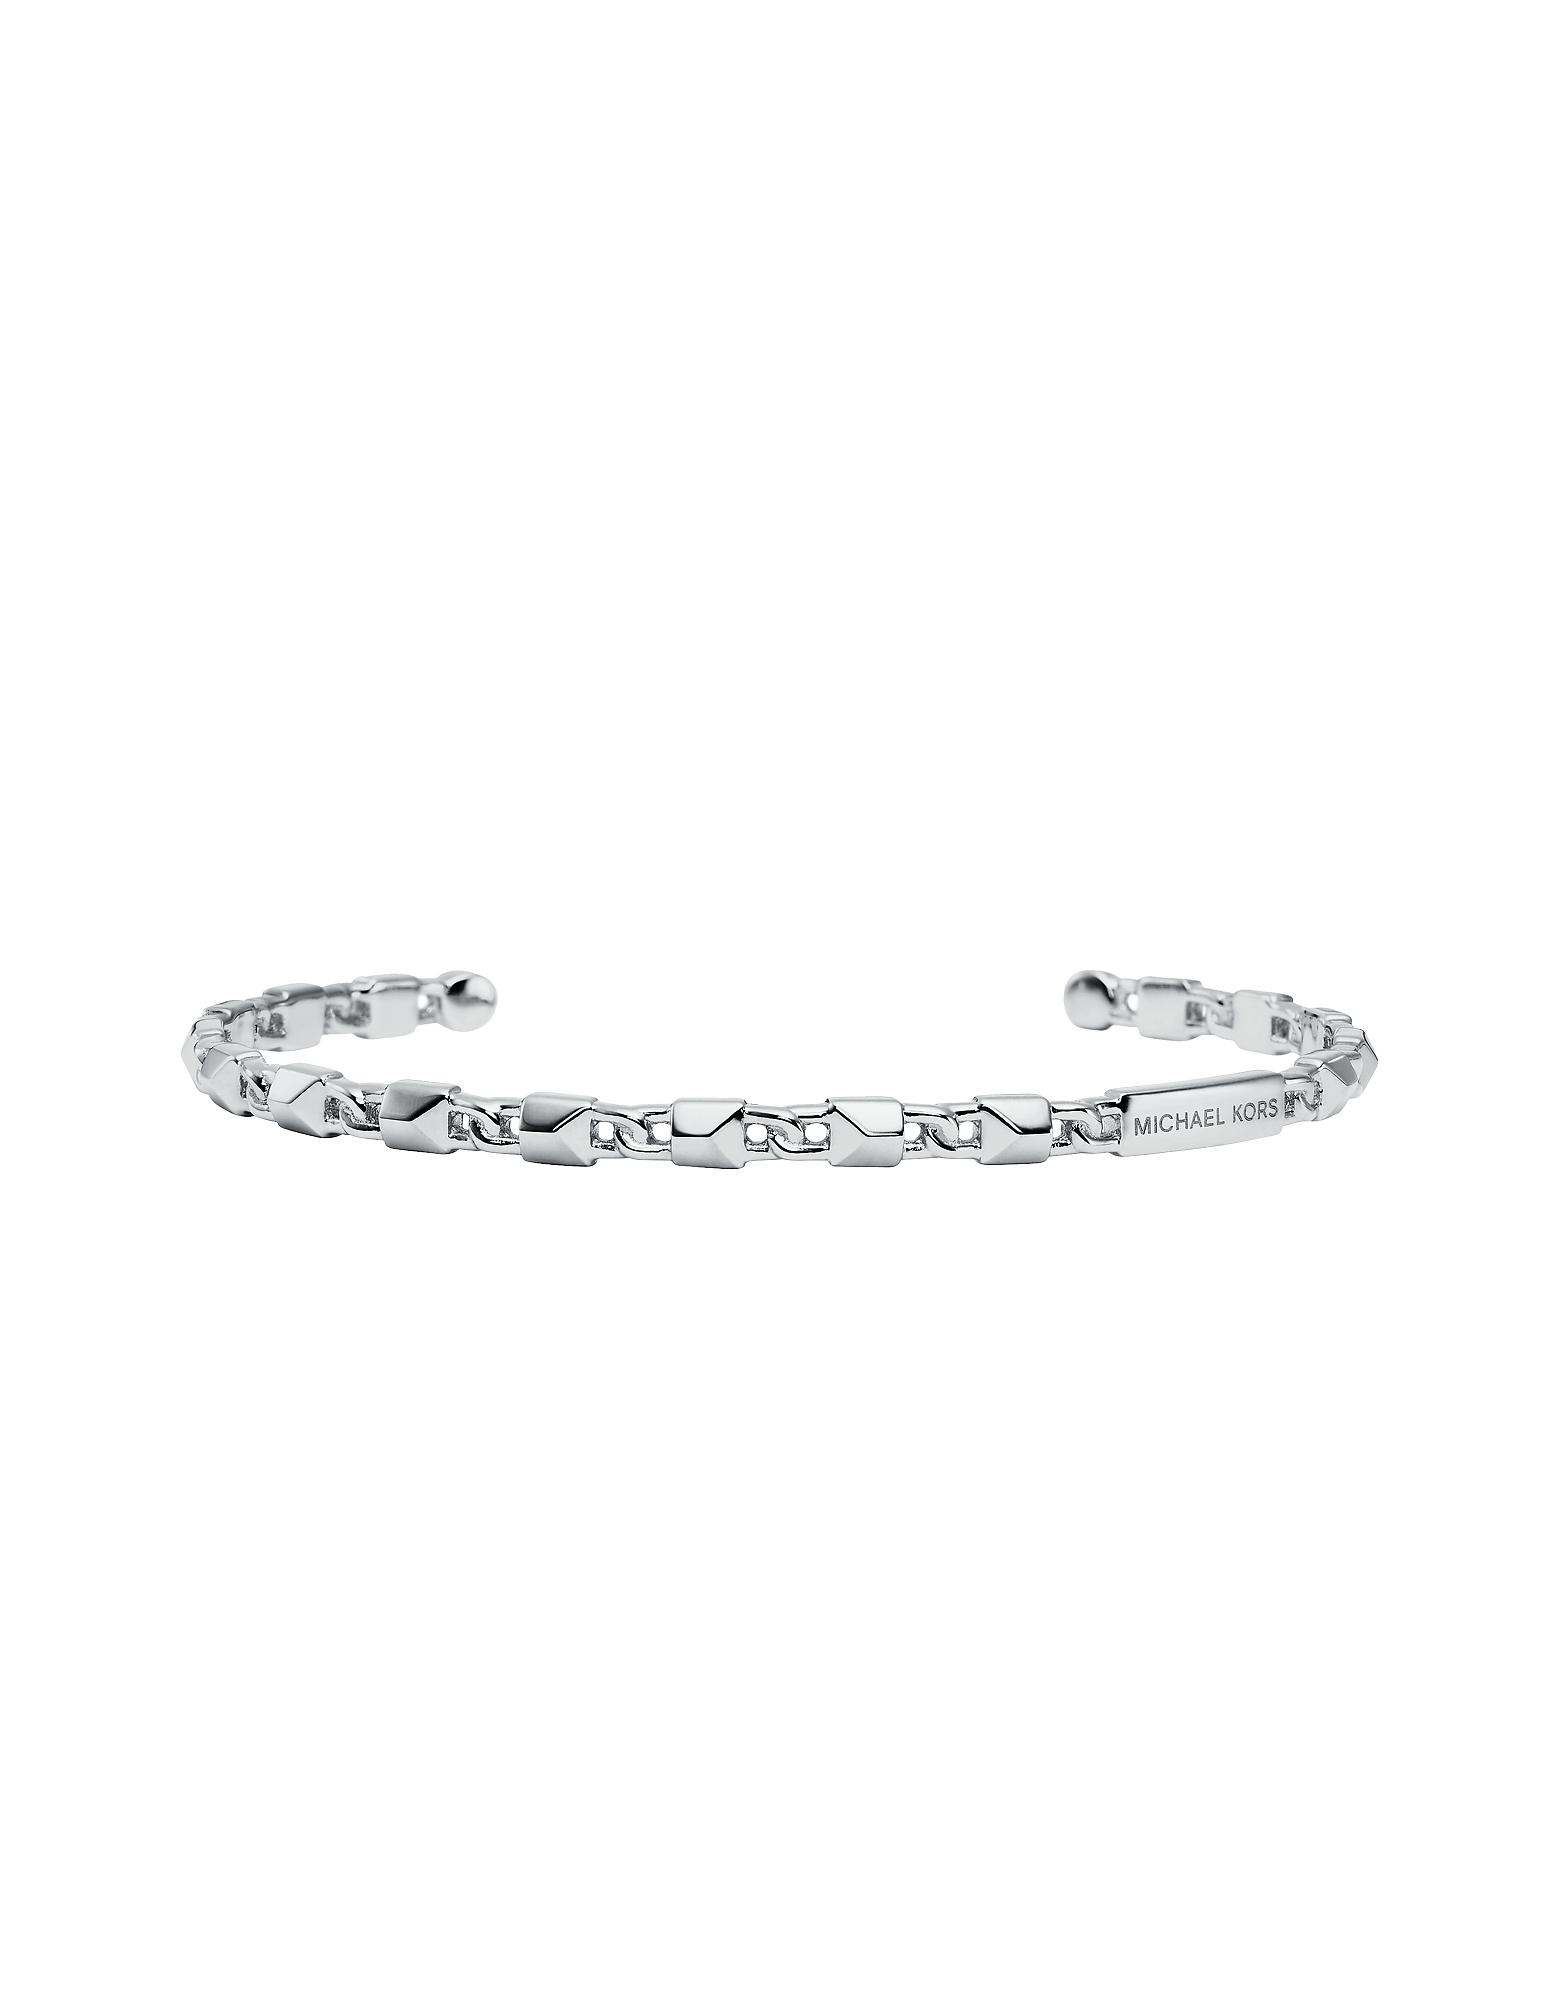 477b2cd5910f6 Michael Kors Bracelets   Fashionbash USA